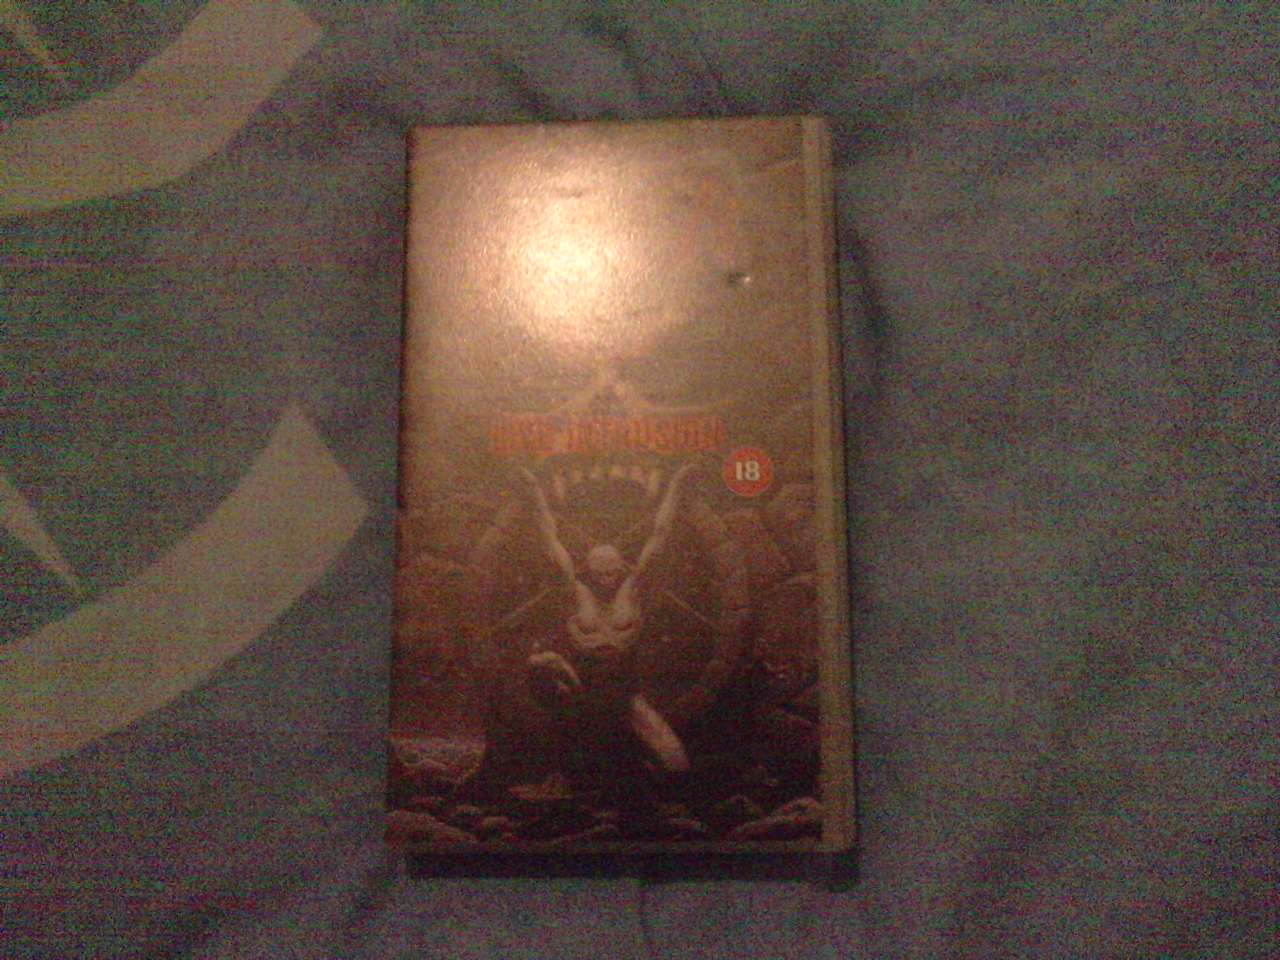 Slayer VHS.JPG